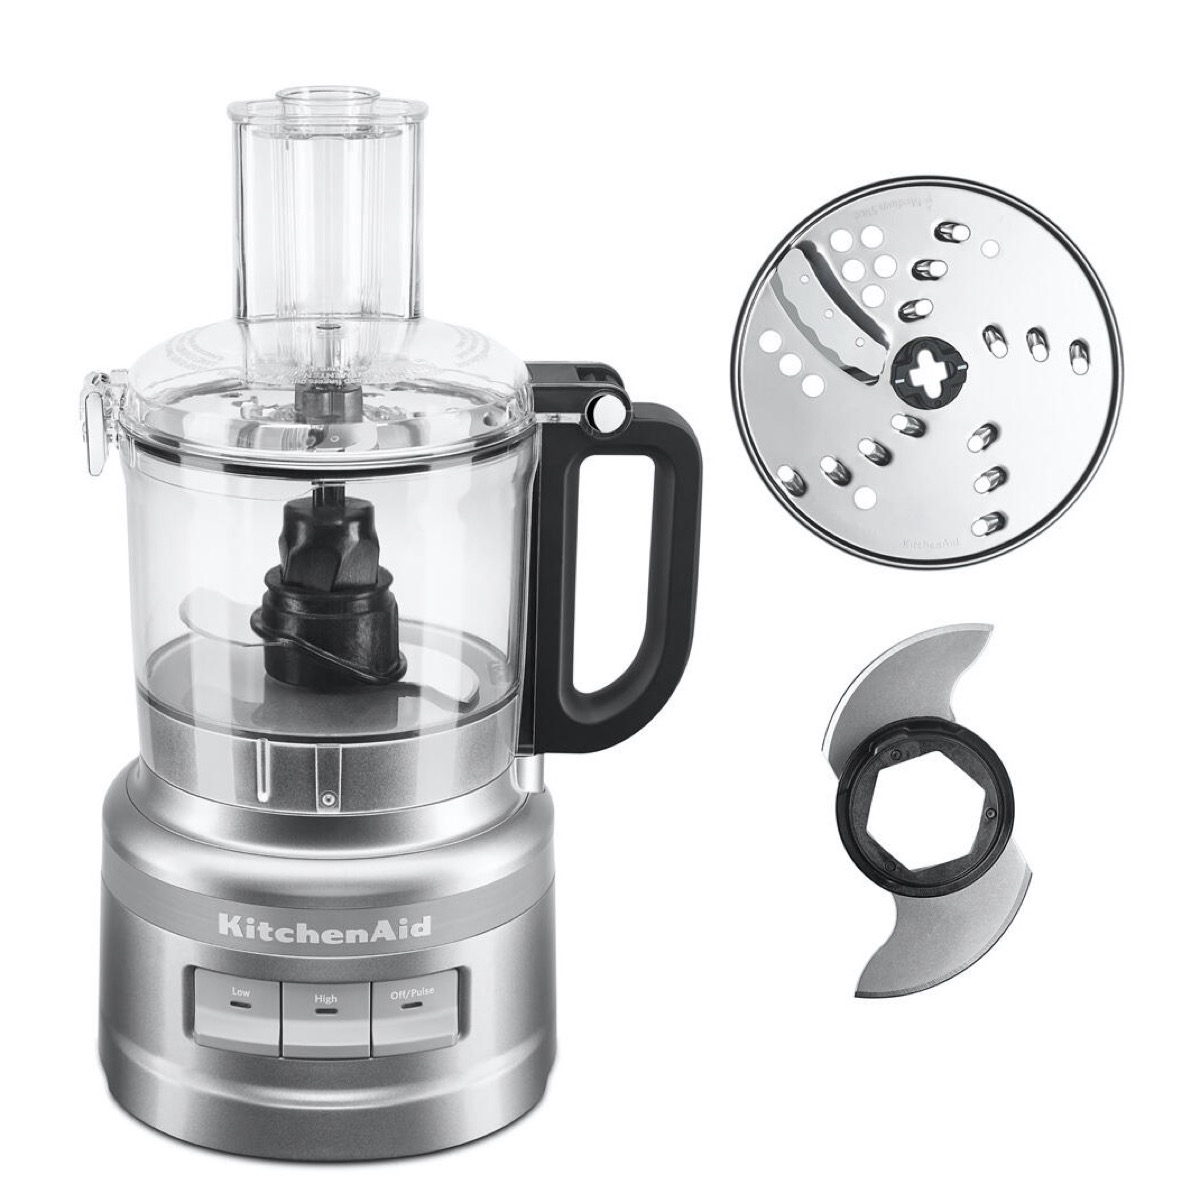 silver kitchenaid food processor next to shredding disc and blade attachment